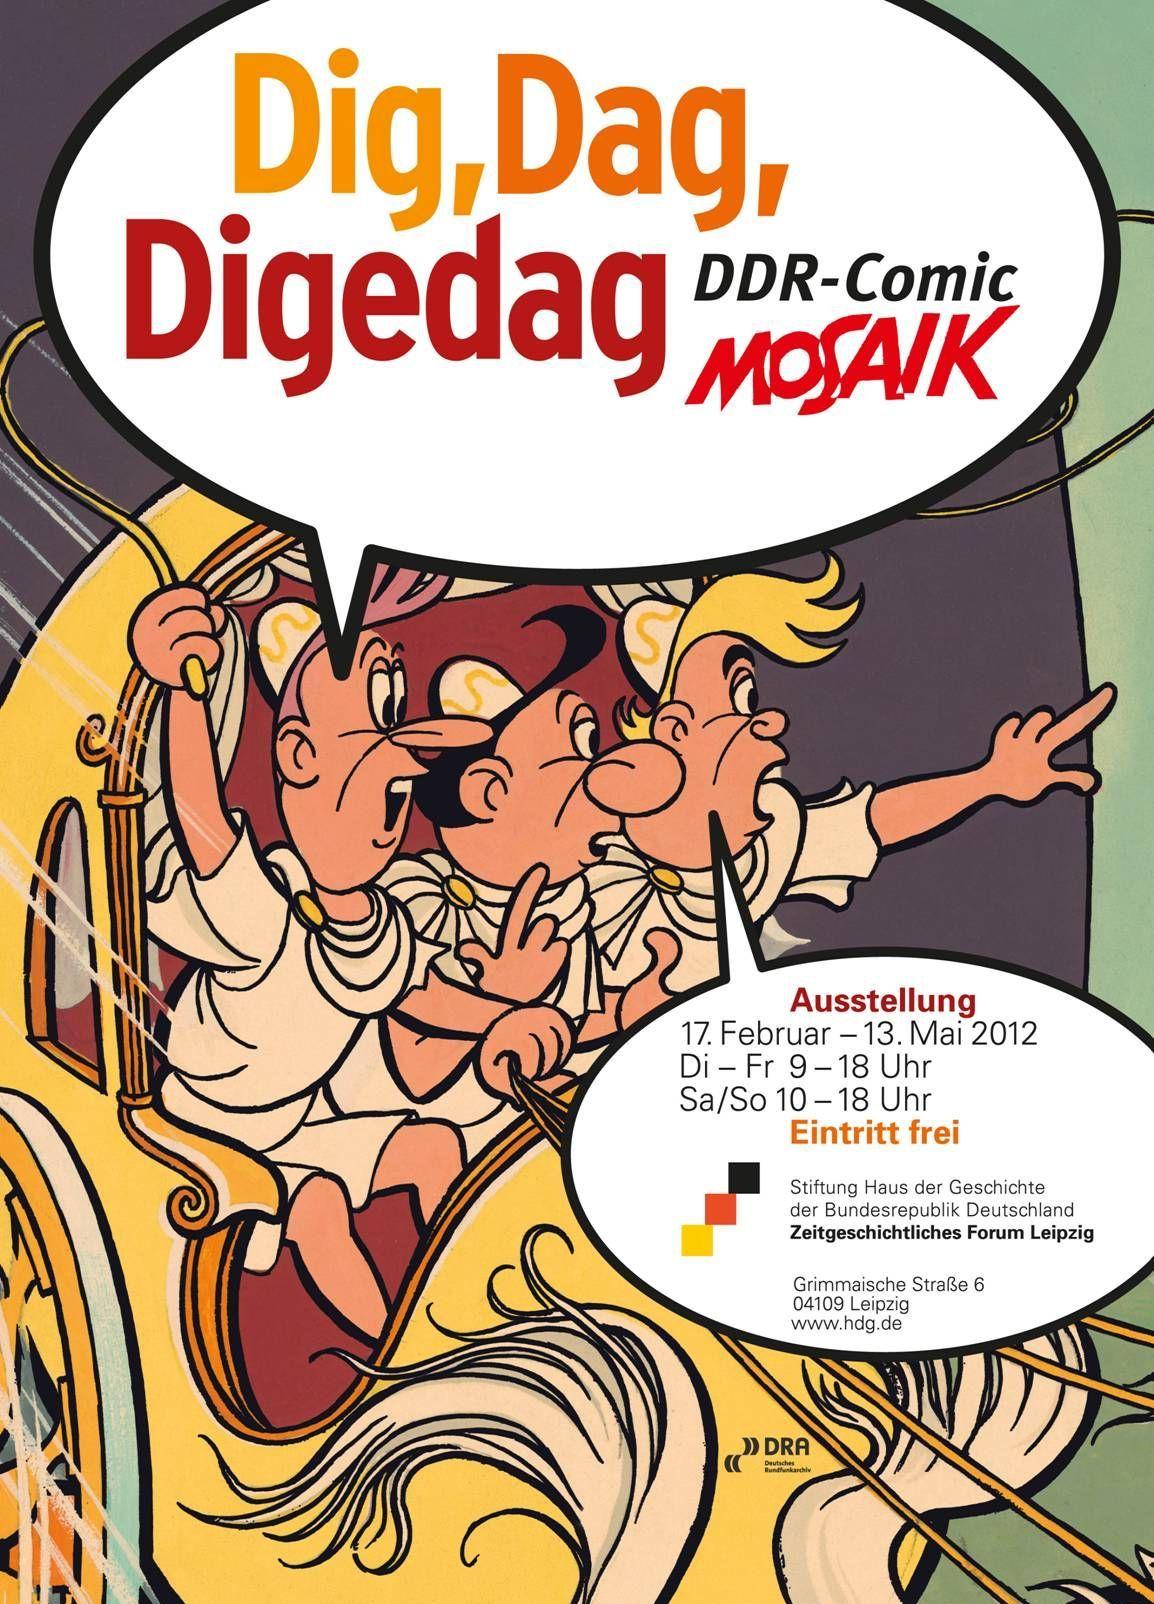 Ausstellungsplakat Dig, Dag, Digedag - DDR-Comic Mosaik